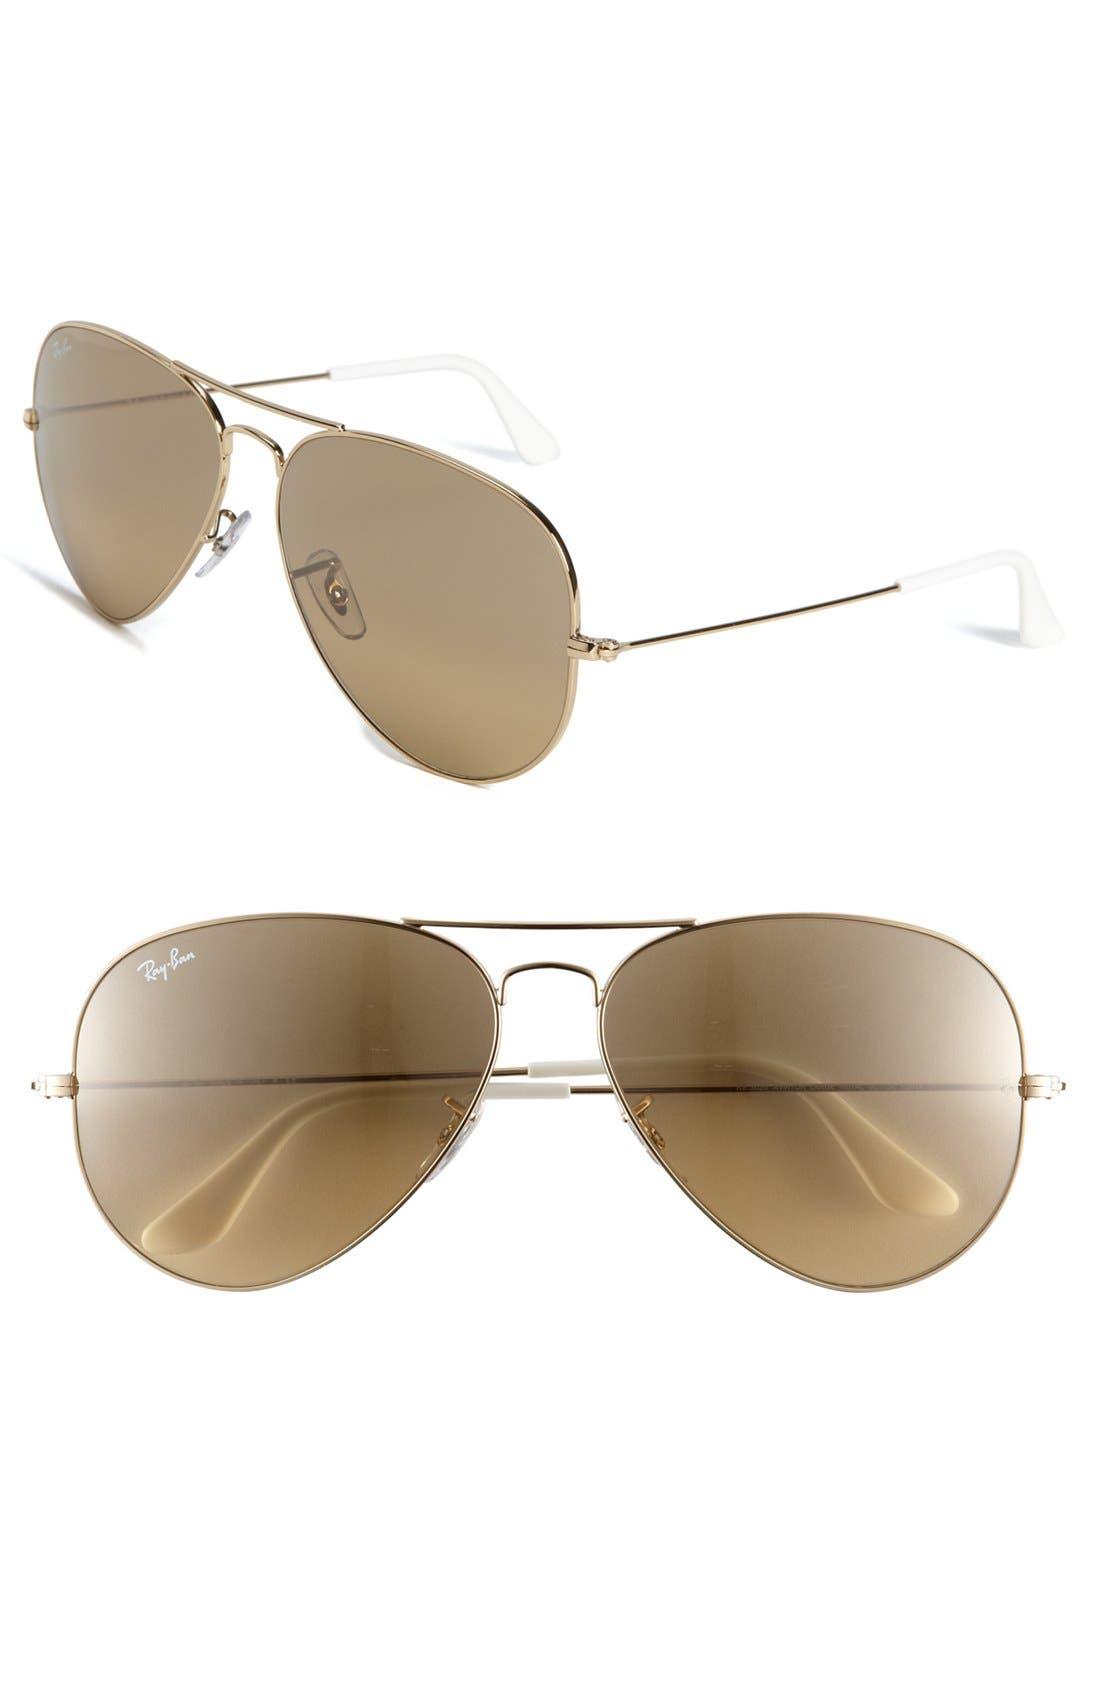 Ray-Ban Large Original 62Mm Aviator Sunglasses -